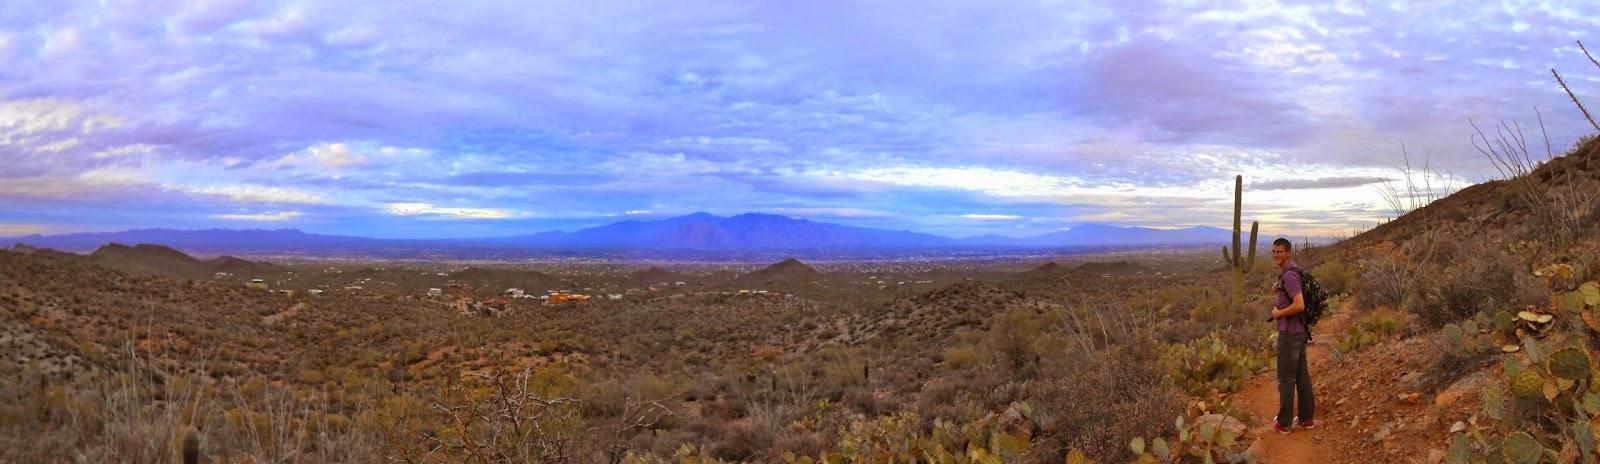 sunset in saguaro national park tucson arizona